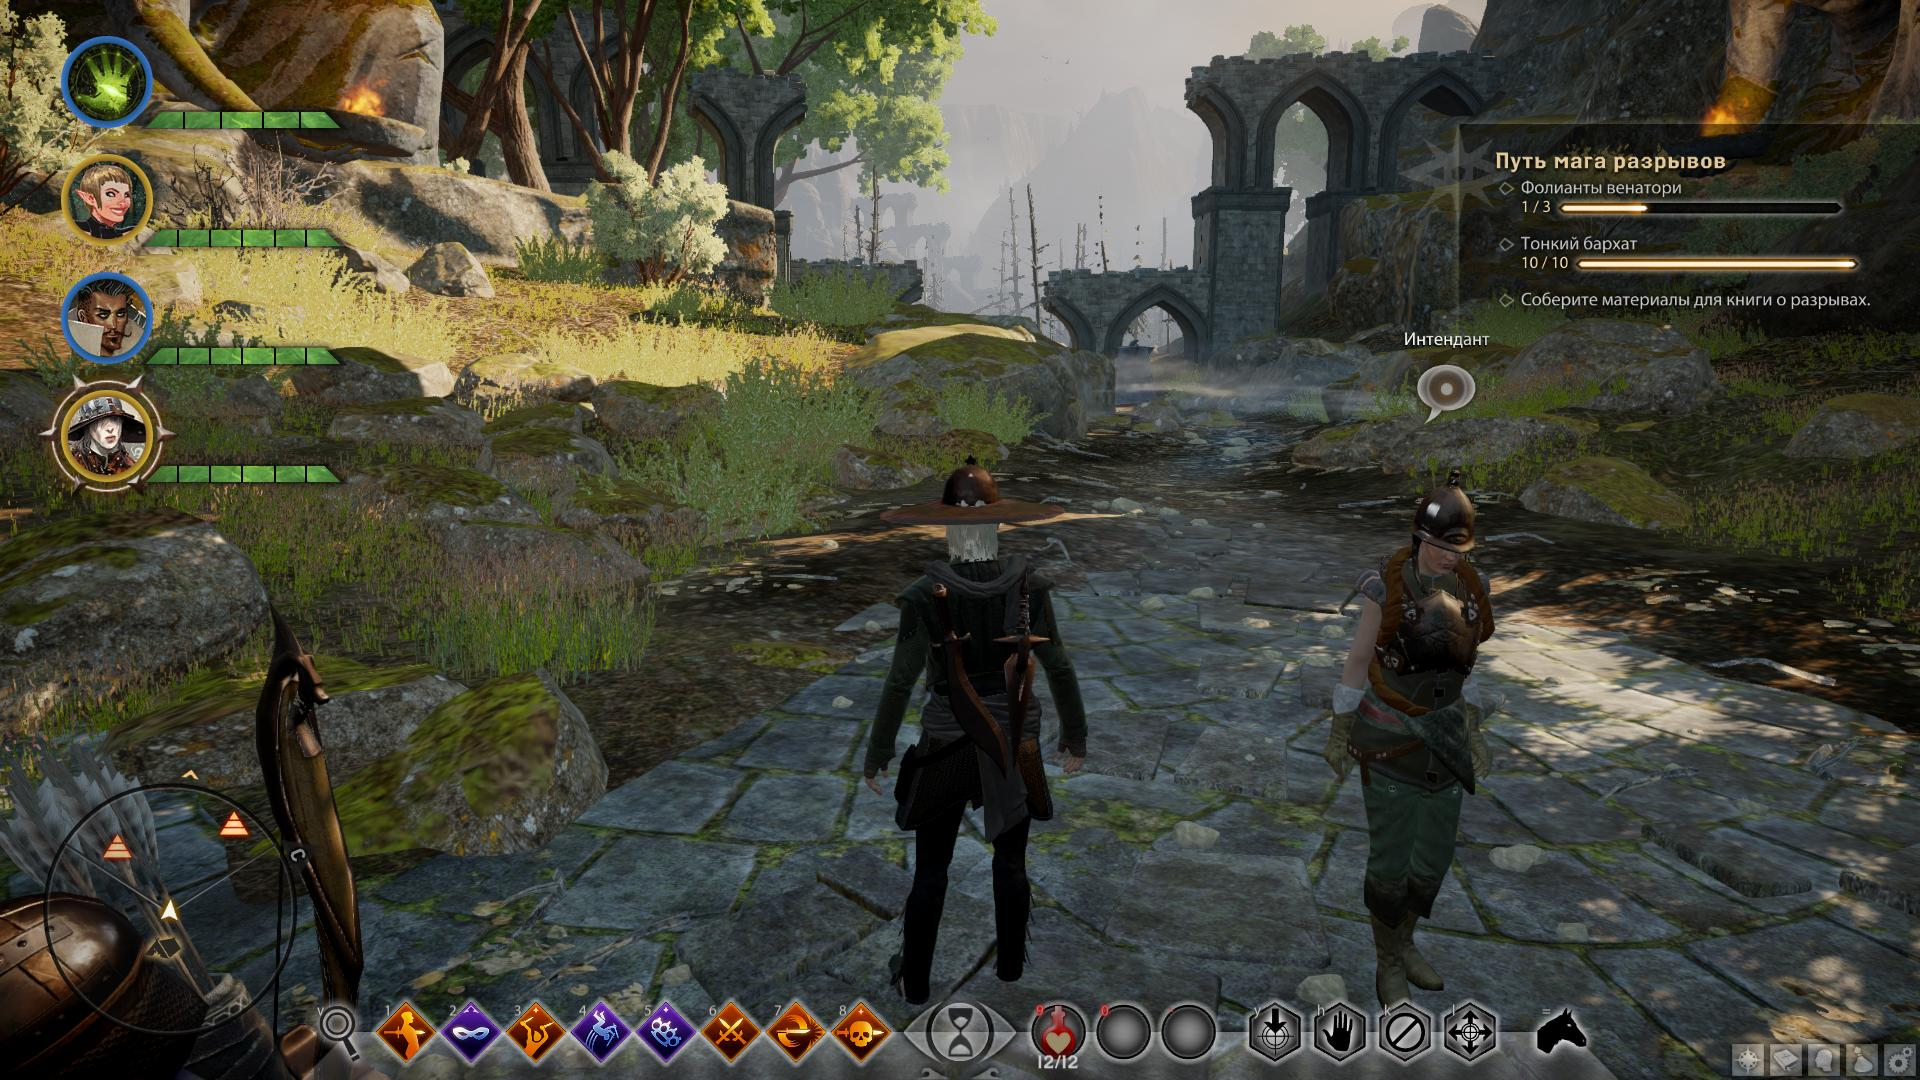 Dragon age inquisition помощь по игре